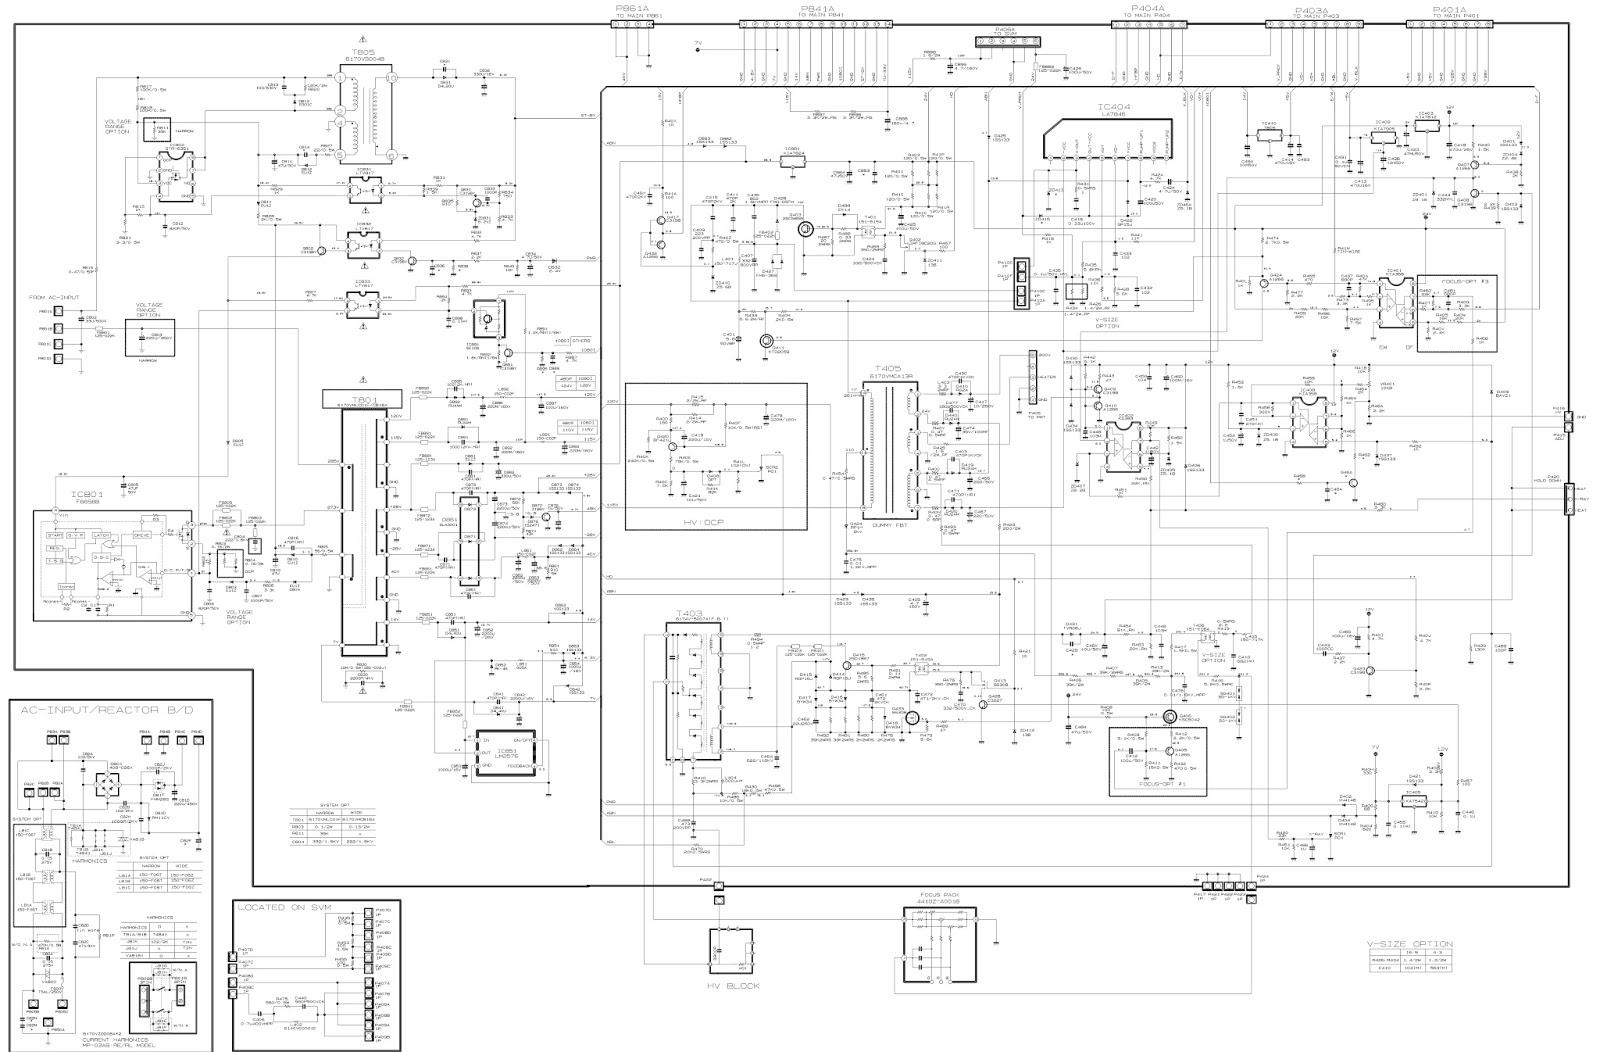 DIAGRAM] Schematic Circuit Diagram Str FULL Version HD Quality